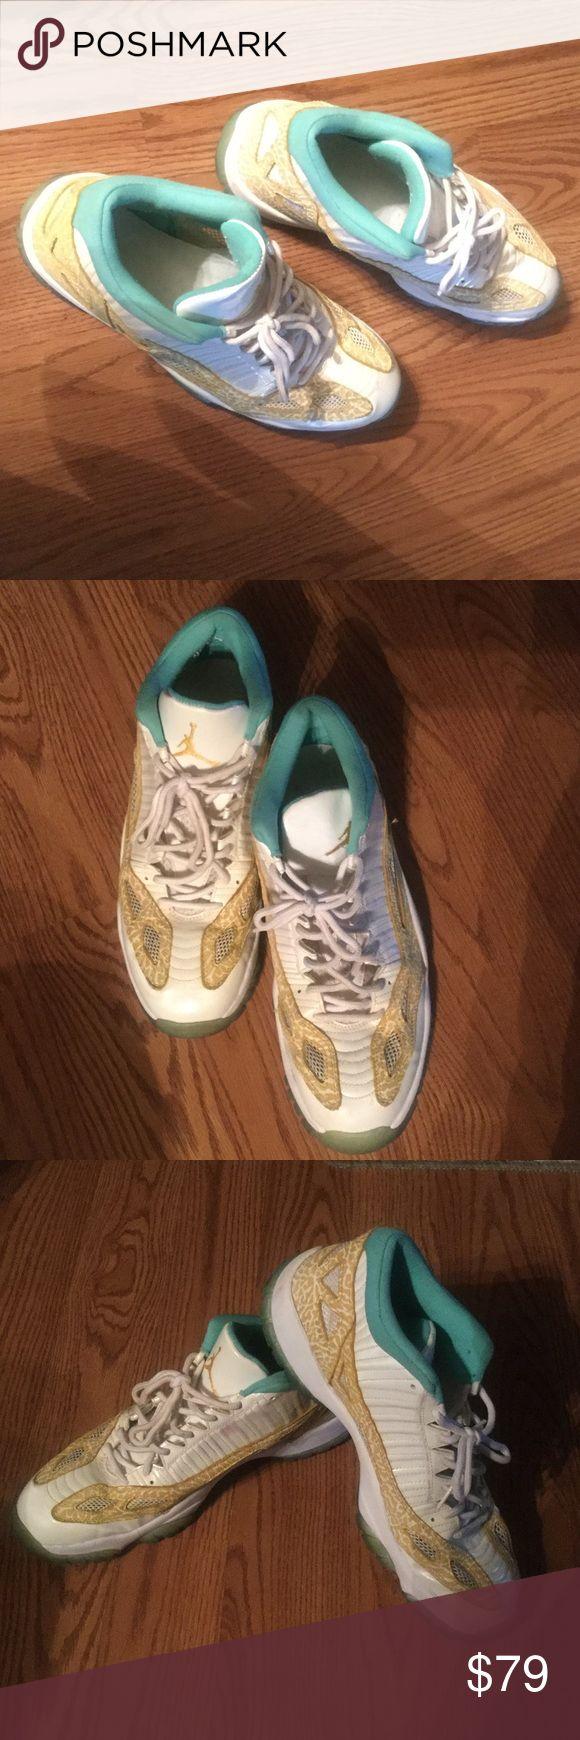 25+ best ideas about Jordans Size 13 on Pinterest | Retro jordans ...